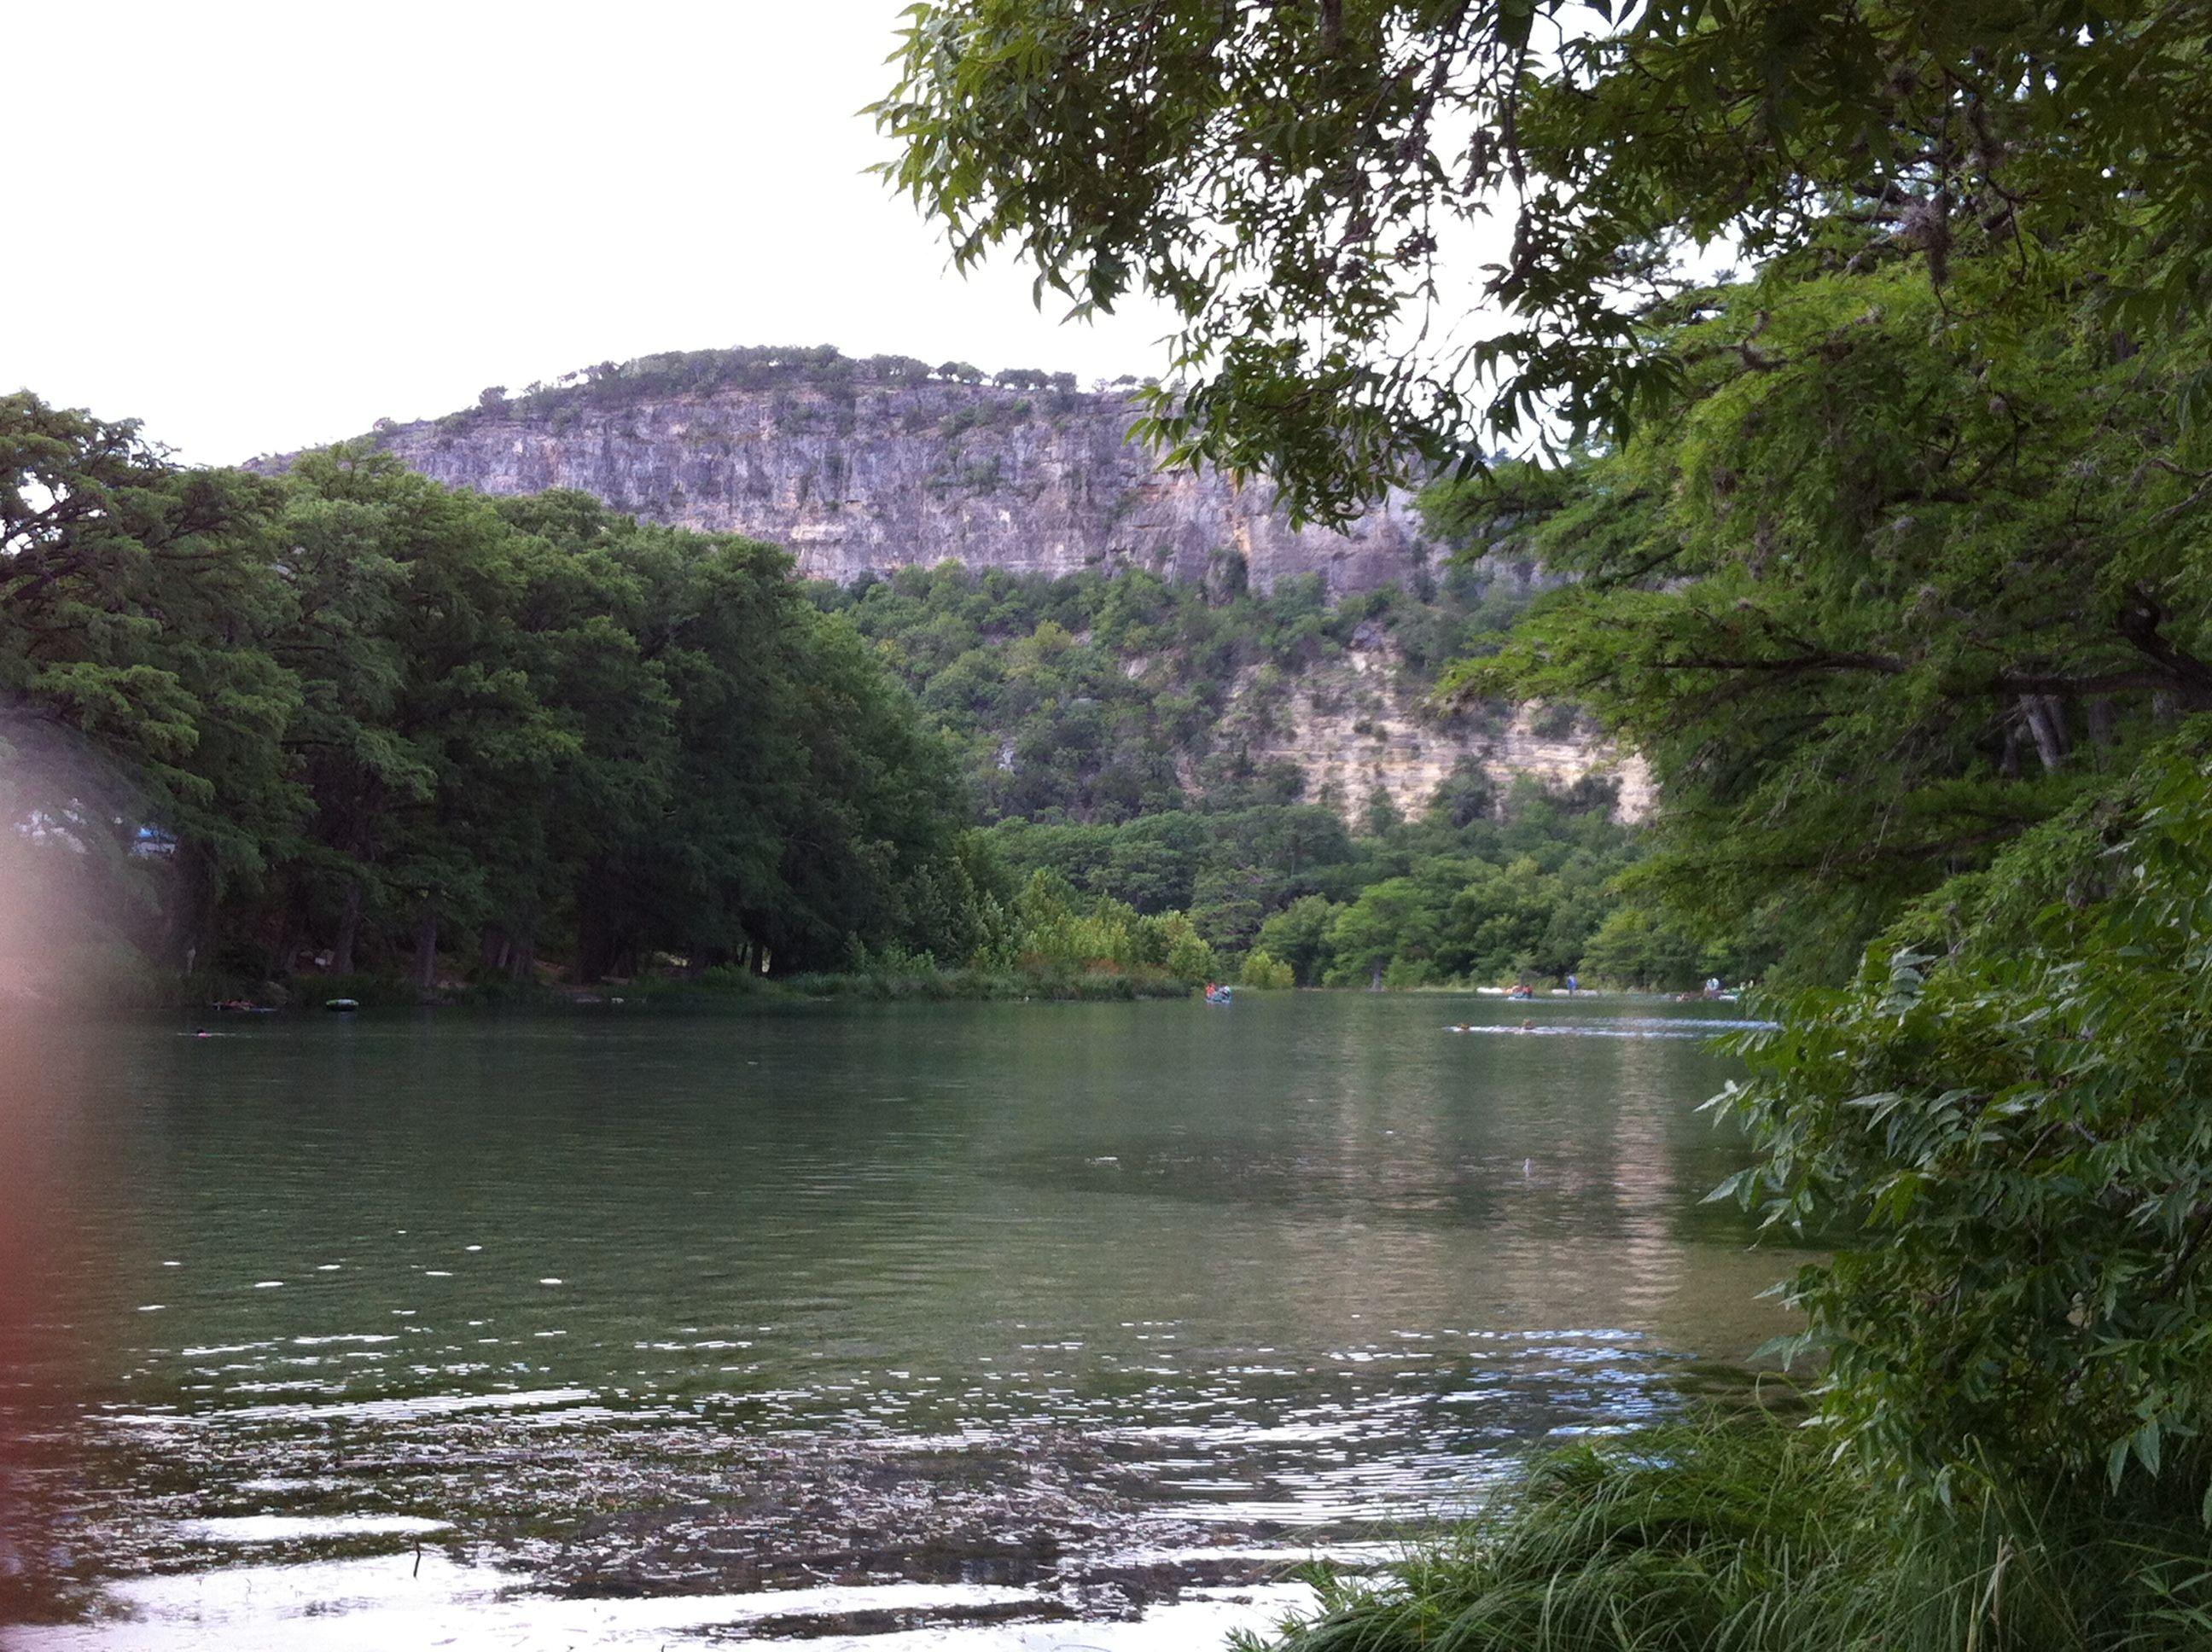 Garner State Park, Concan, Texas | GARNER | Pinterest